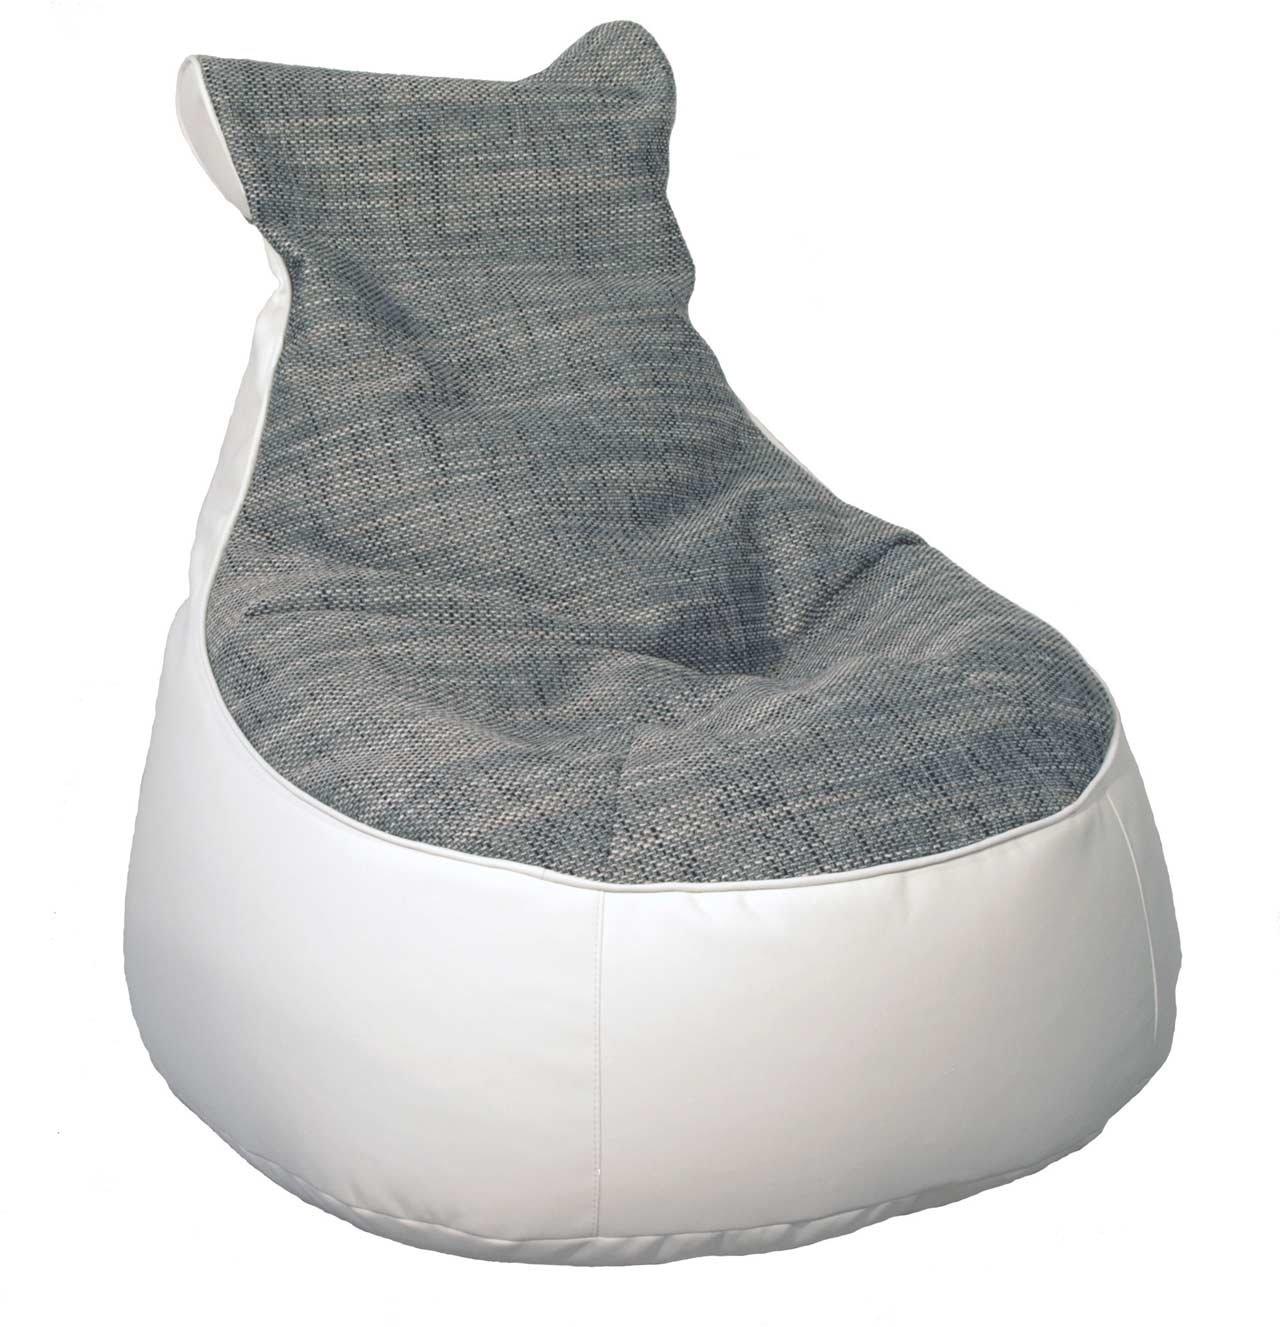 Lifestyle4living Sitzsack, Sitzkissen, Bodenkissen, Relaxkissen, Relaxkissen, Kunstleder weiß, weiß, weiß, Webstoff grau, Füllung EPS-Perlen cc4024